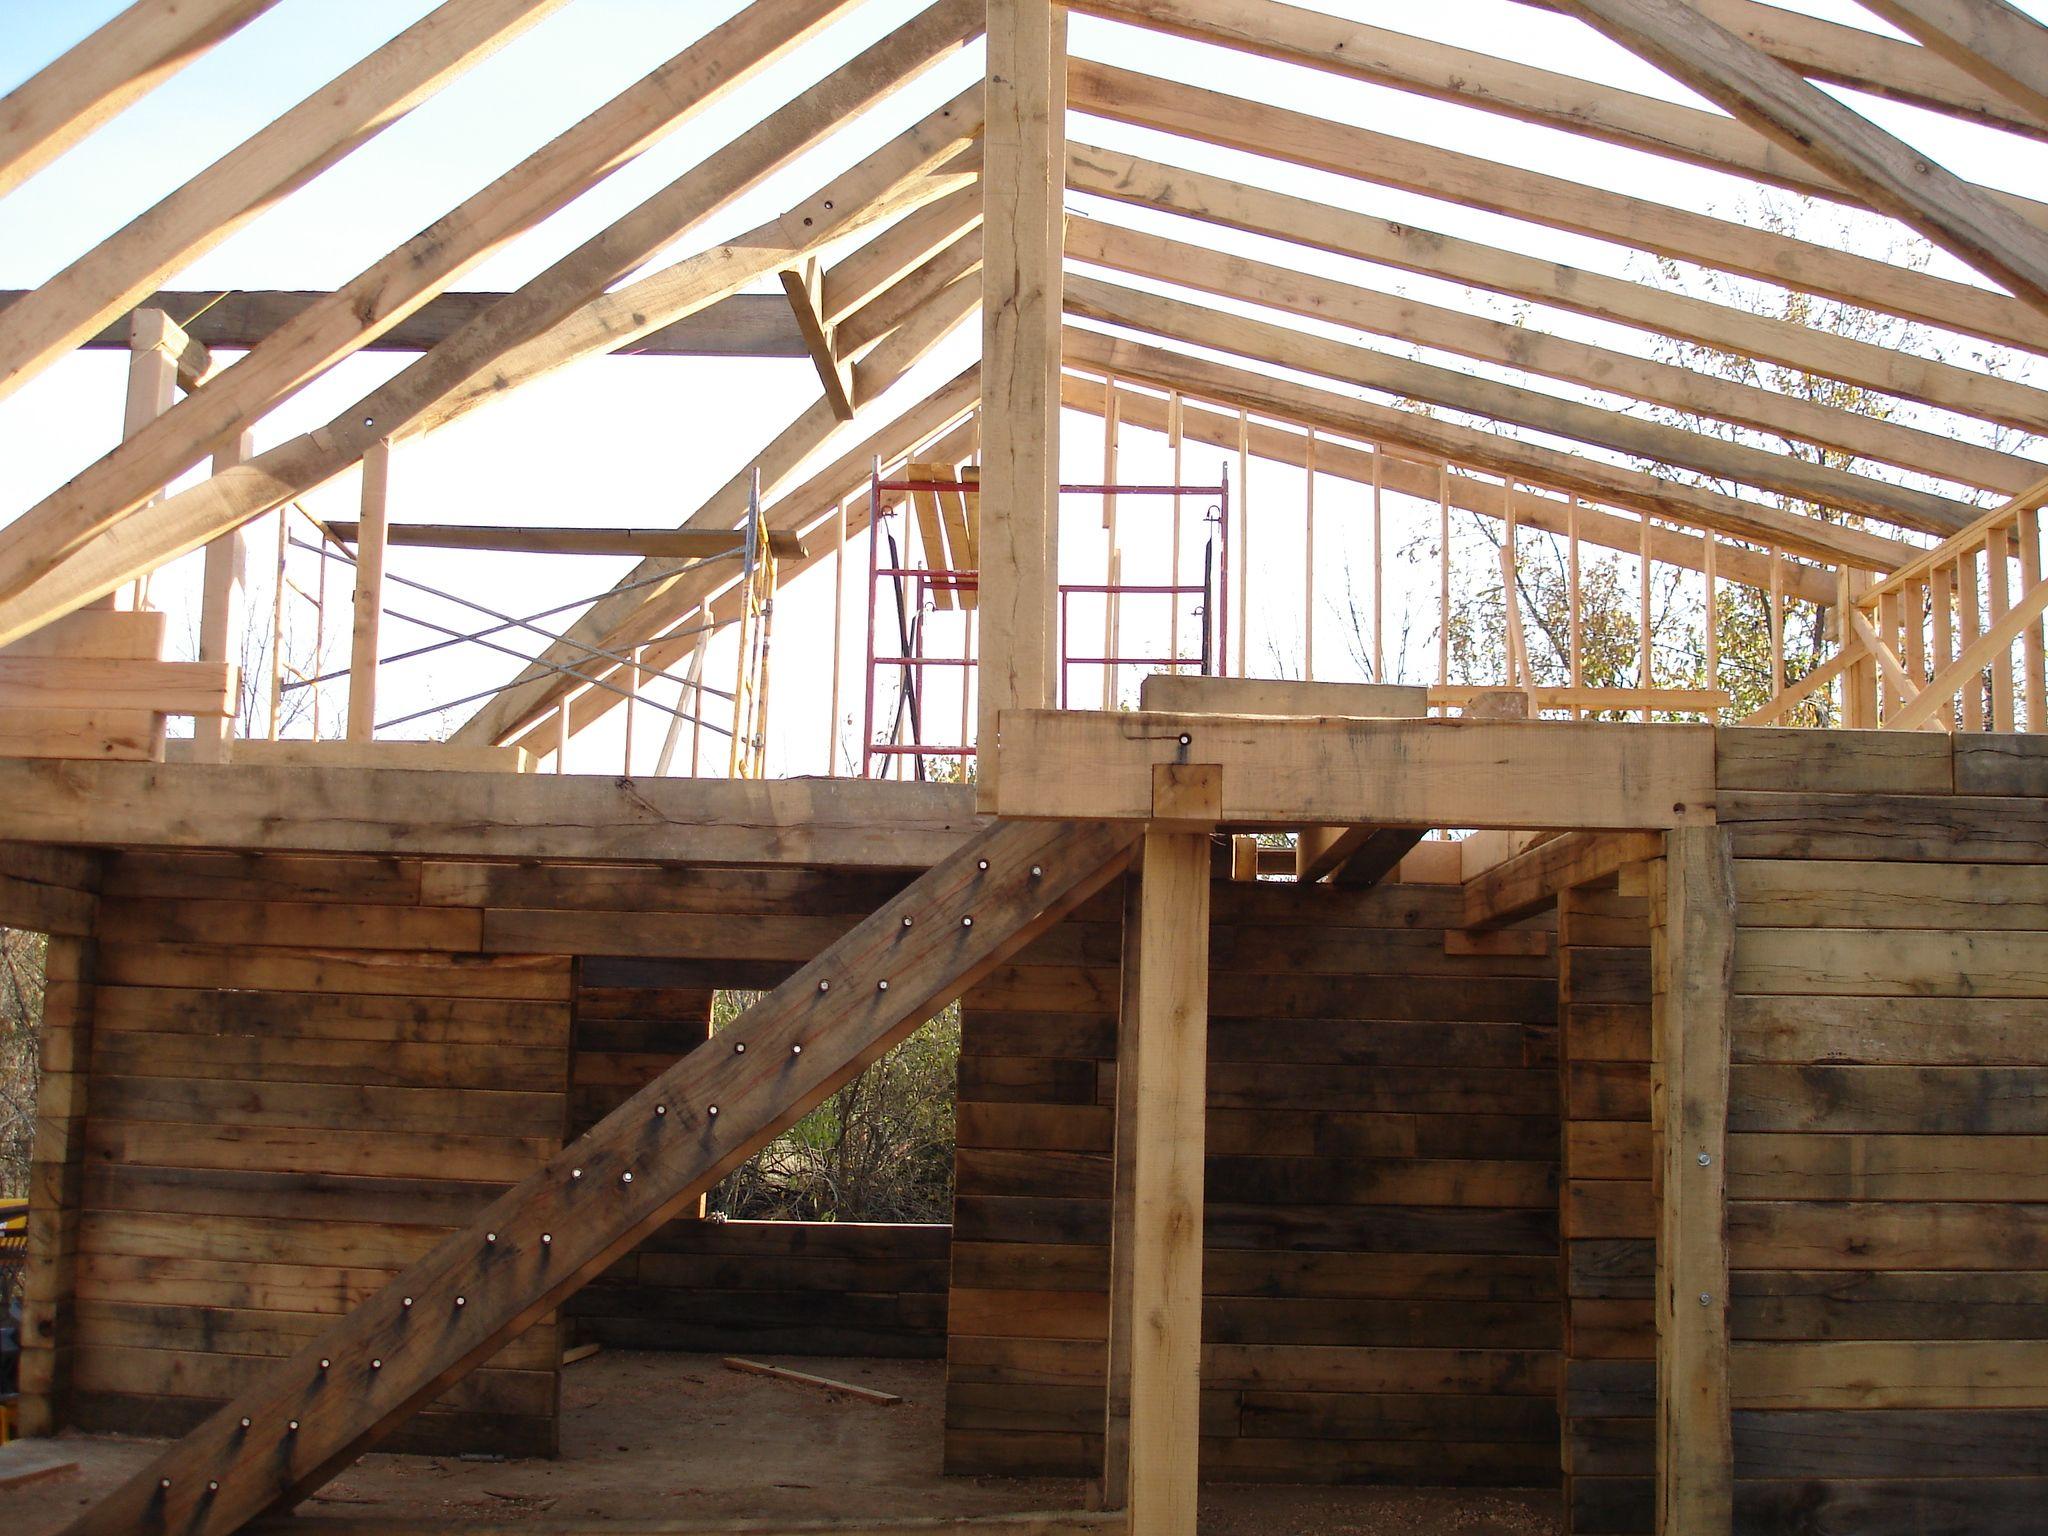 schutt log homes and mill works chalet oak log cabin kits chalet rh pinterest com oak log homes arkansas log home oak ridge tn